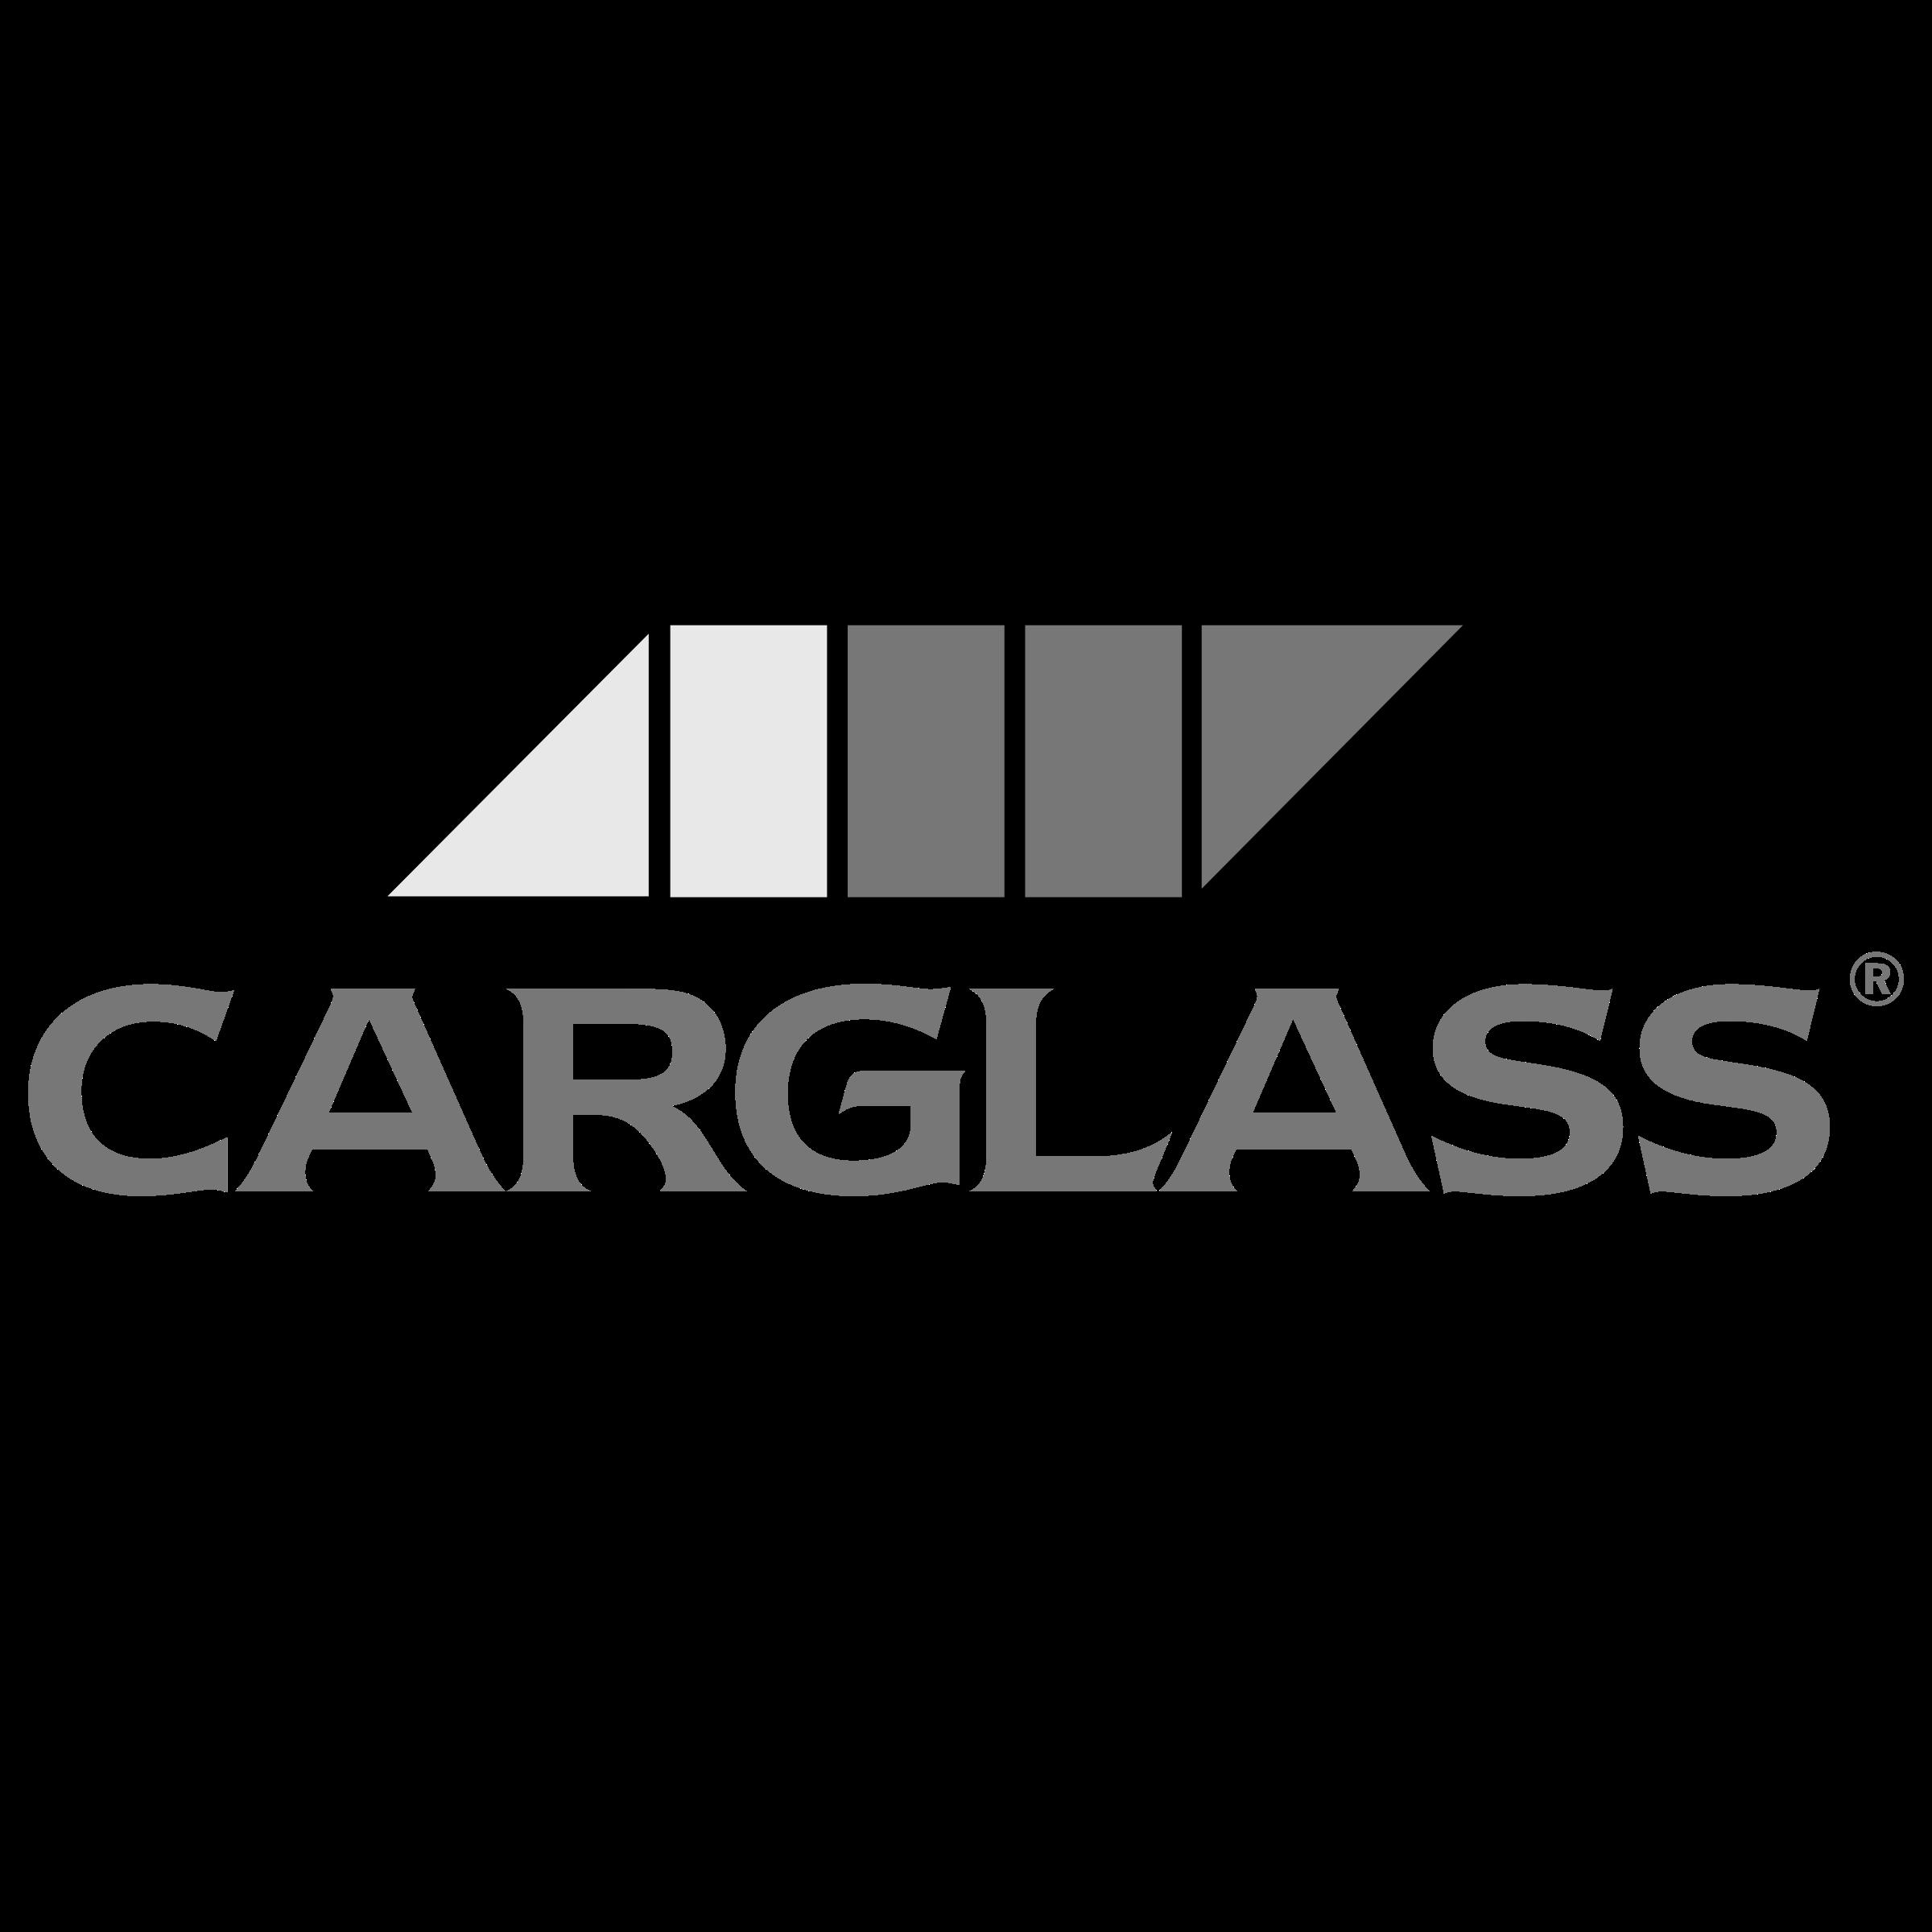 Carglass logo noir et blanc